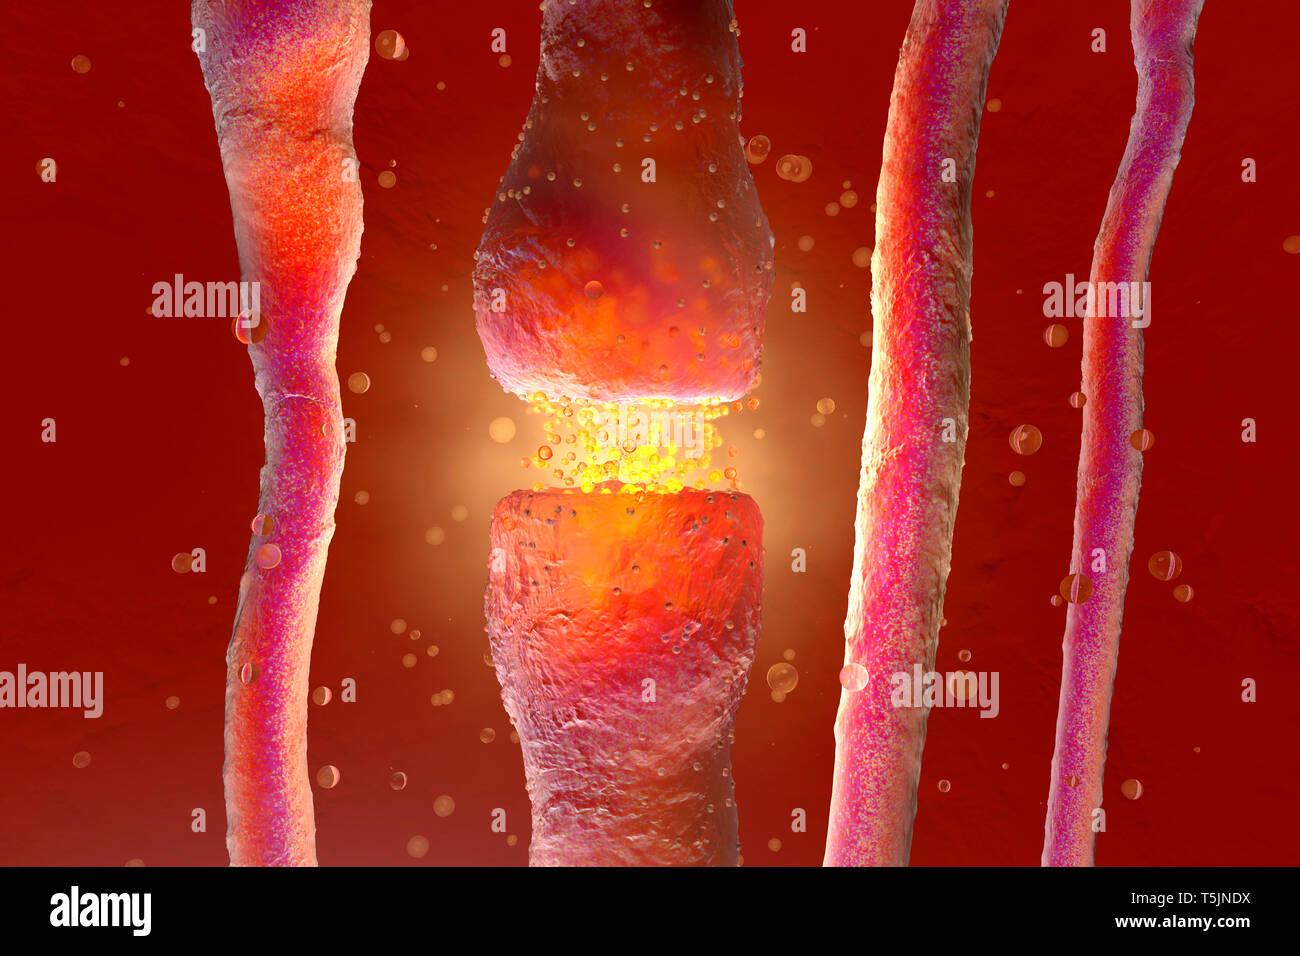 Ilustración 3D, visualización de neuronas disparando neurotransmisores en el espacio sináptico Imagen De Stock